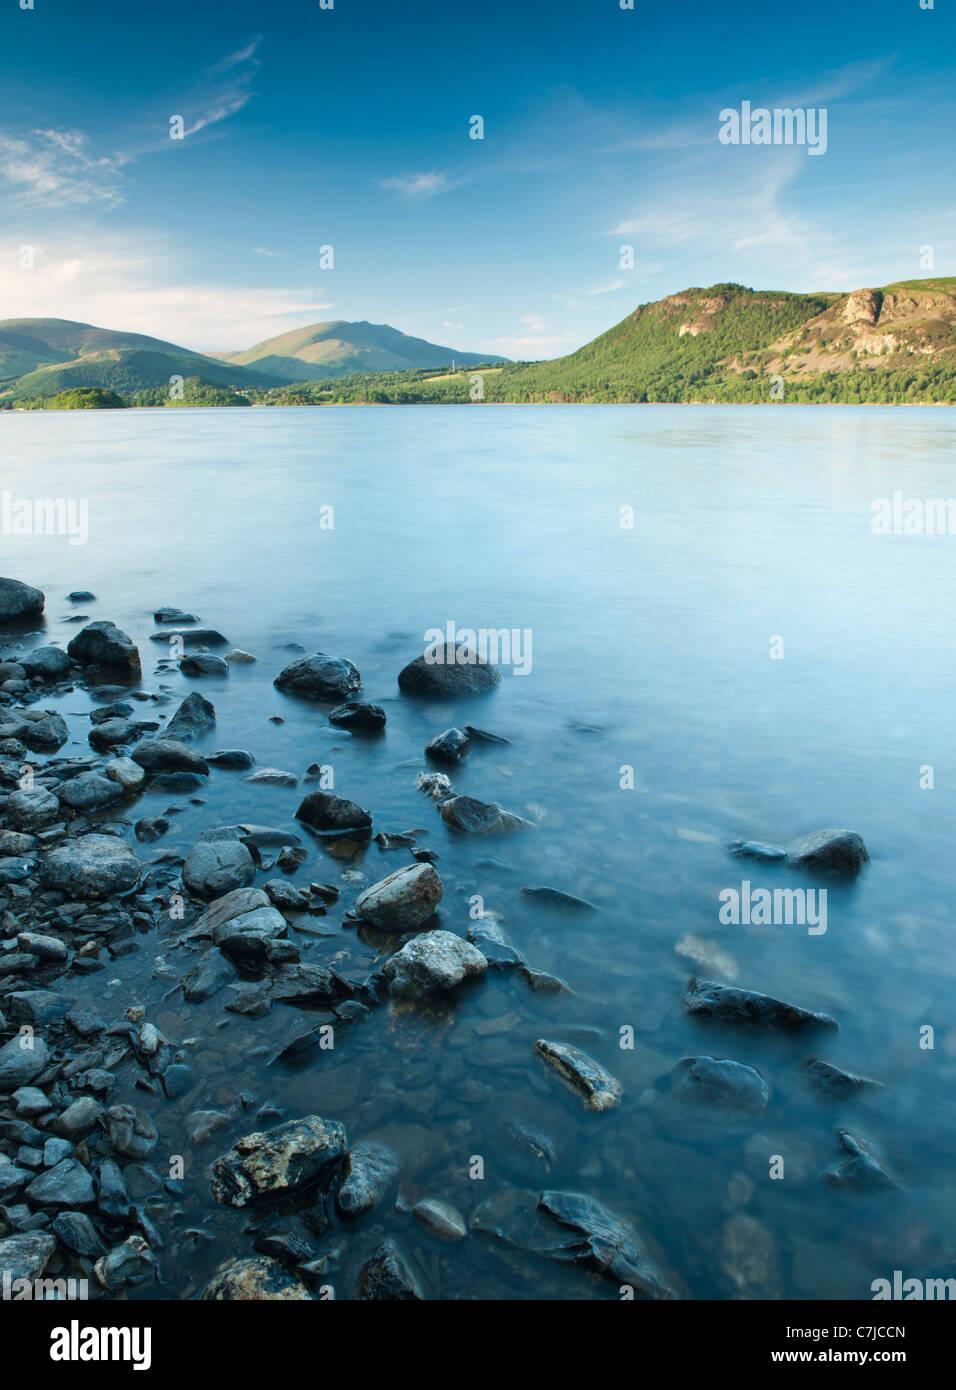 Rochers sur la rive du lac, Brandelhow Bay, Lake District, Cumbria, Royaume-Uni Photo Stock